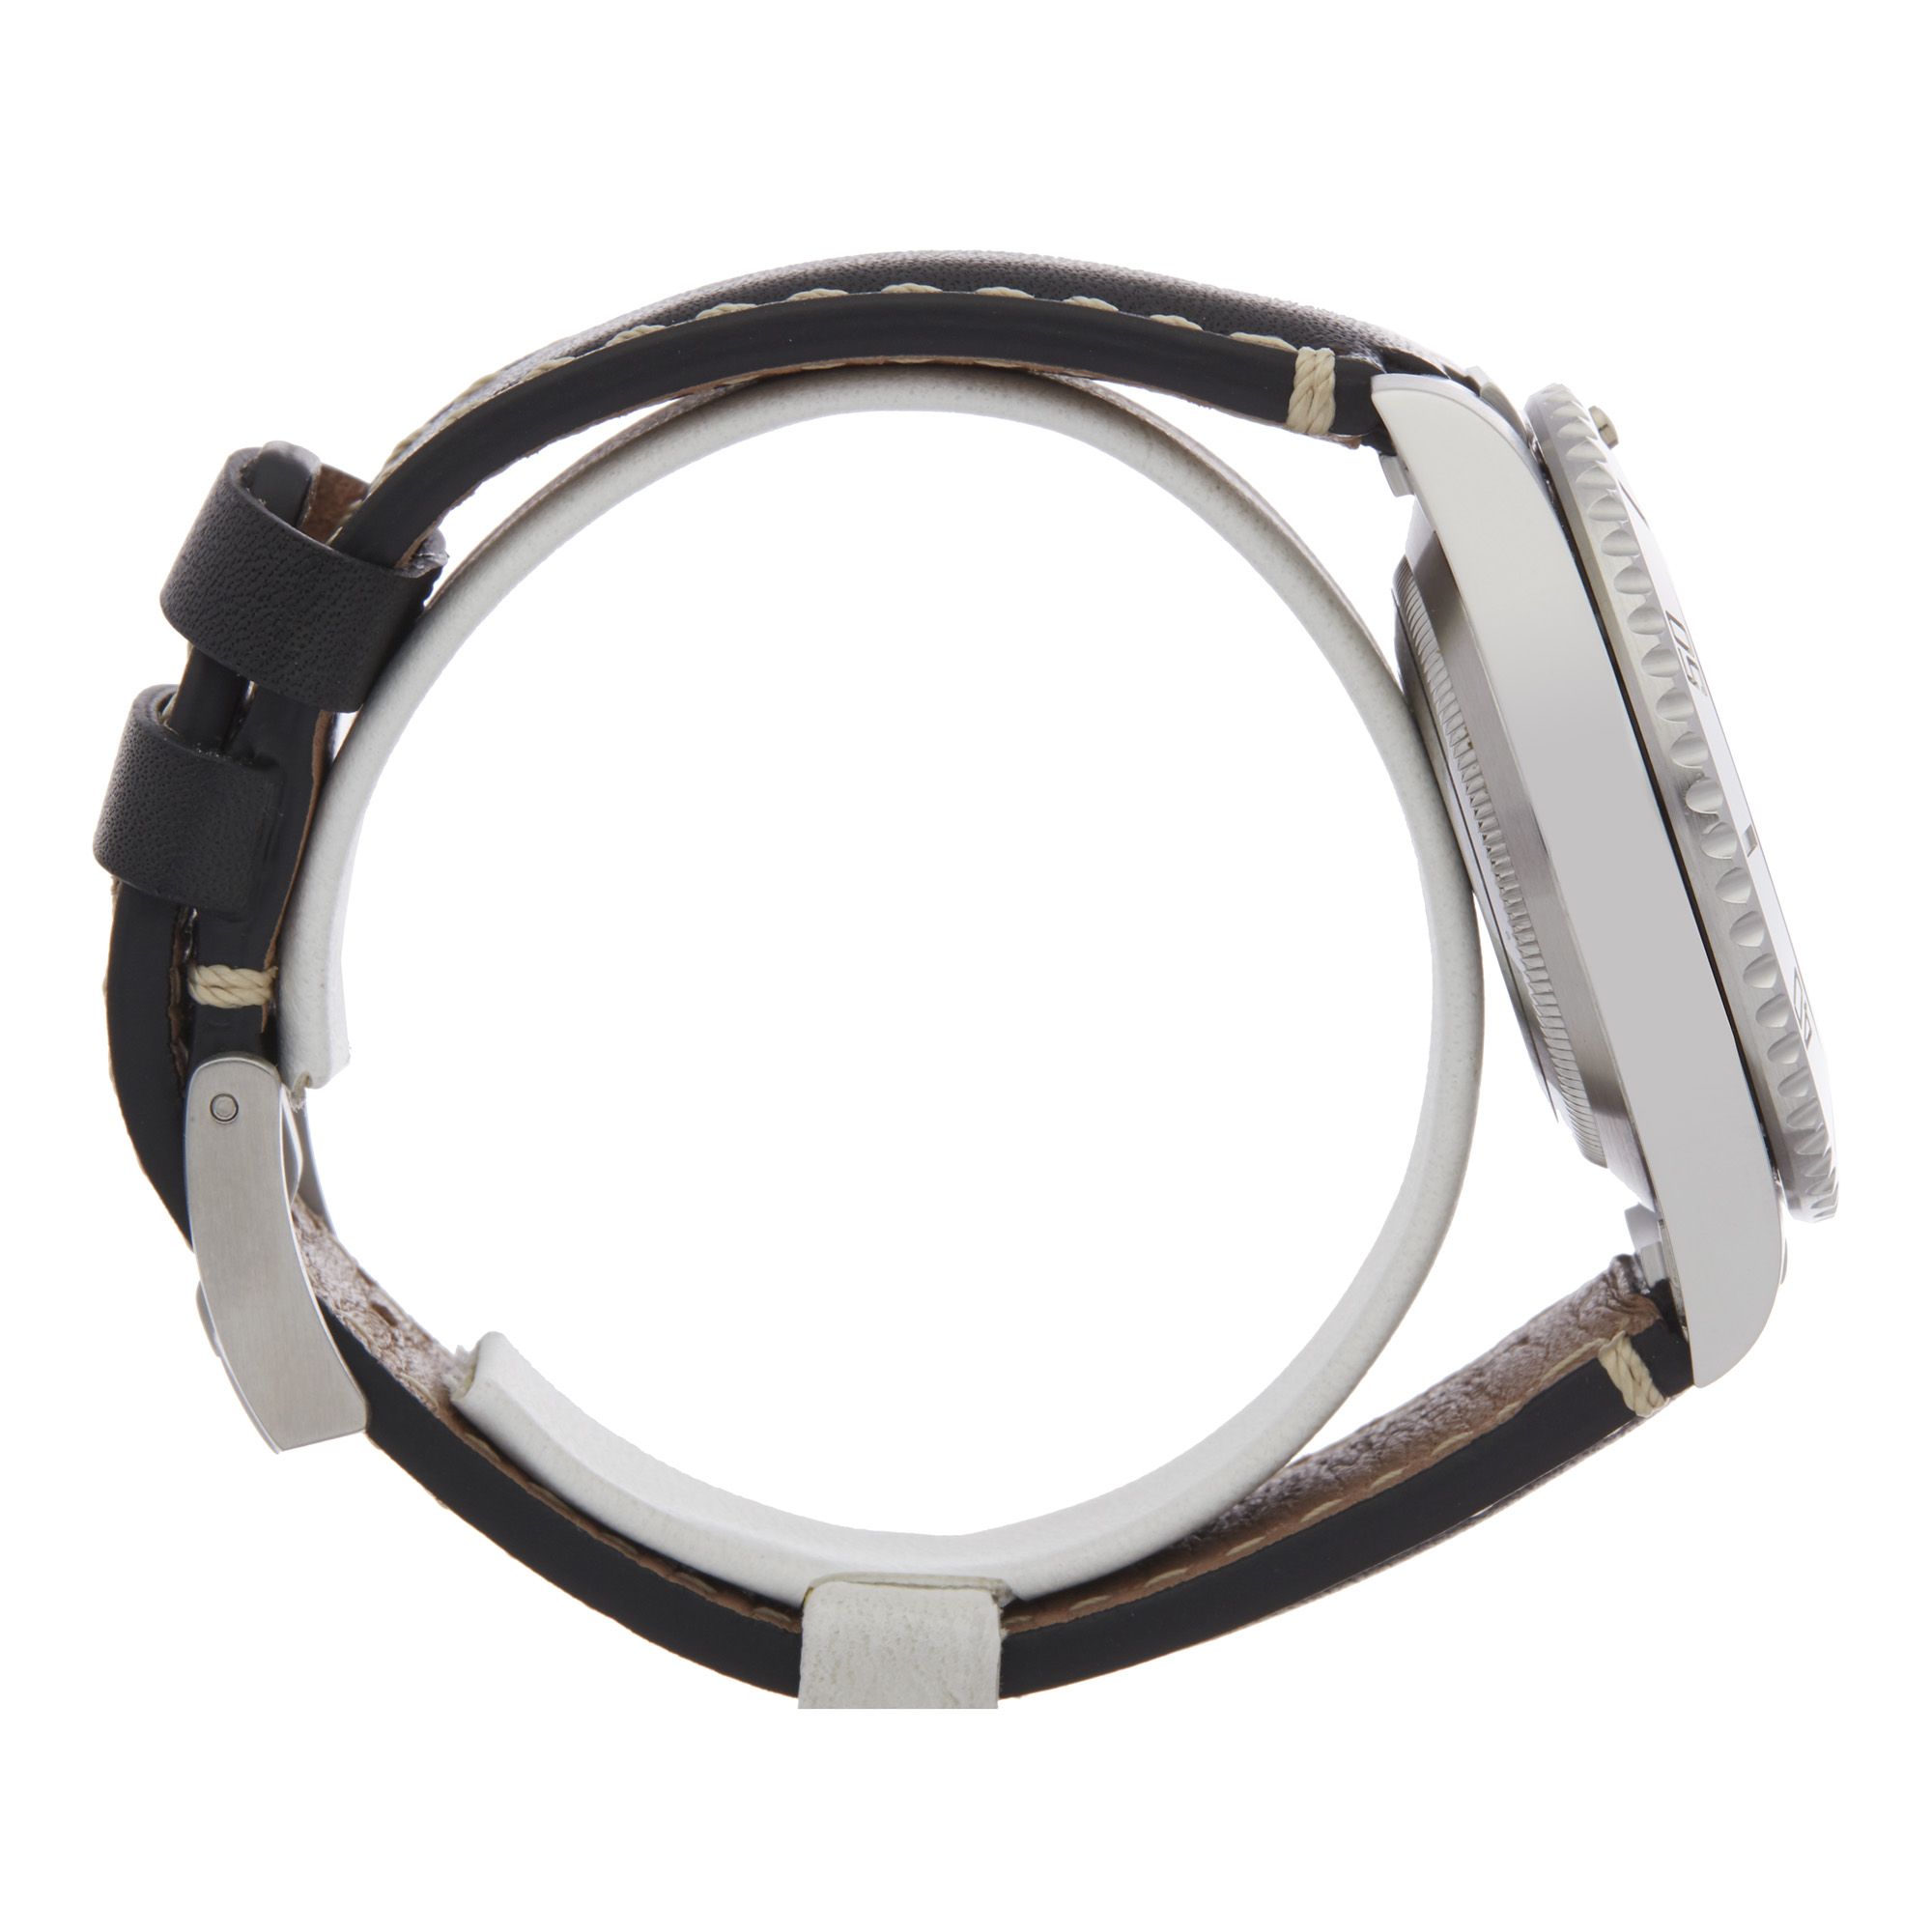 Rolex Submariner No Date 114060 Men Stainless Steel Watch - Image 6 of 8